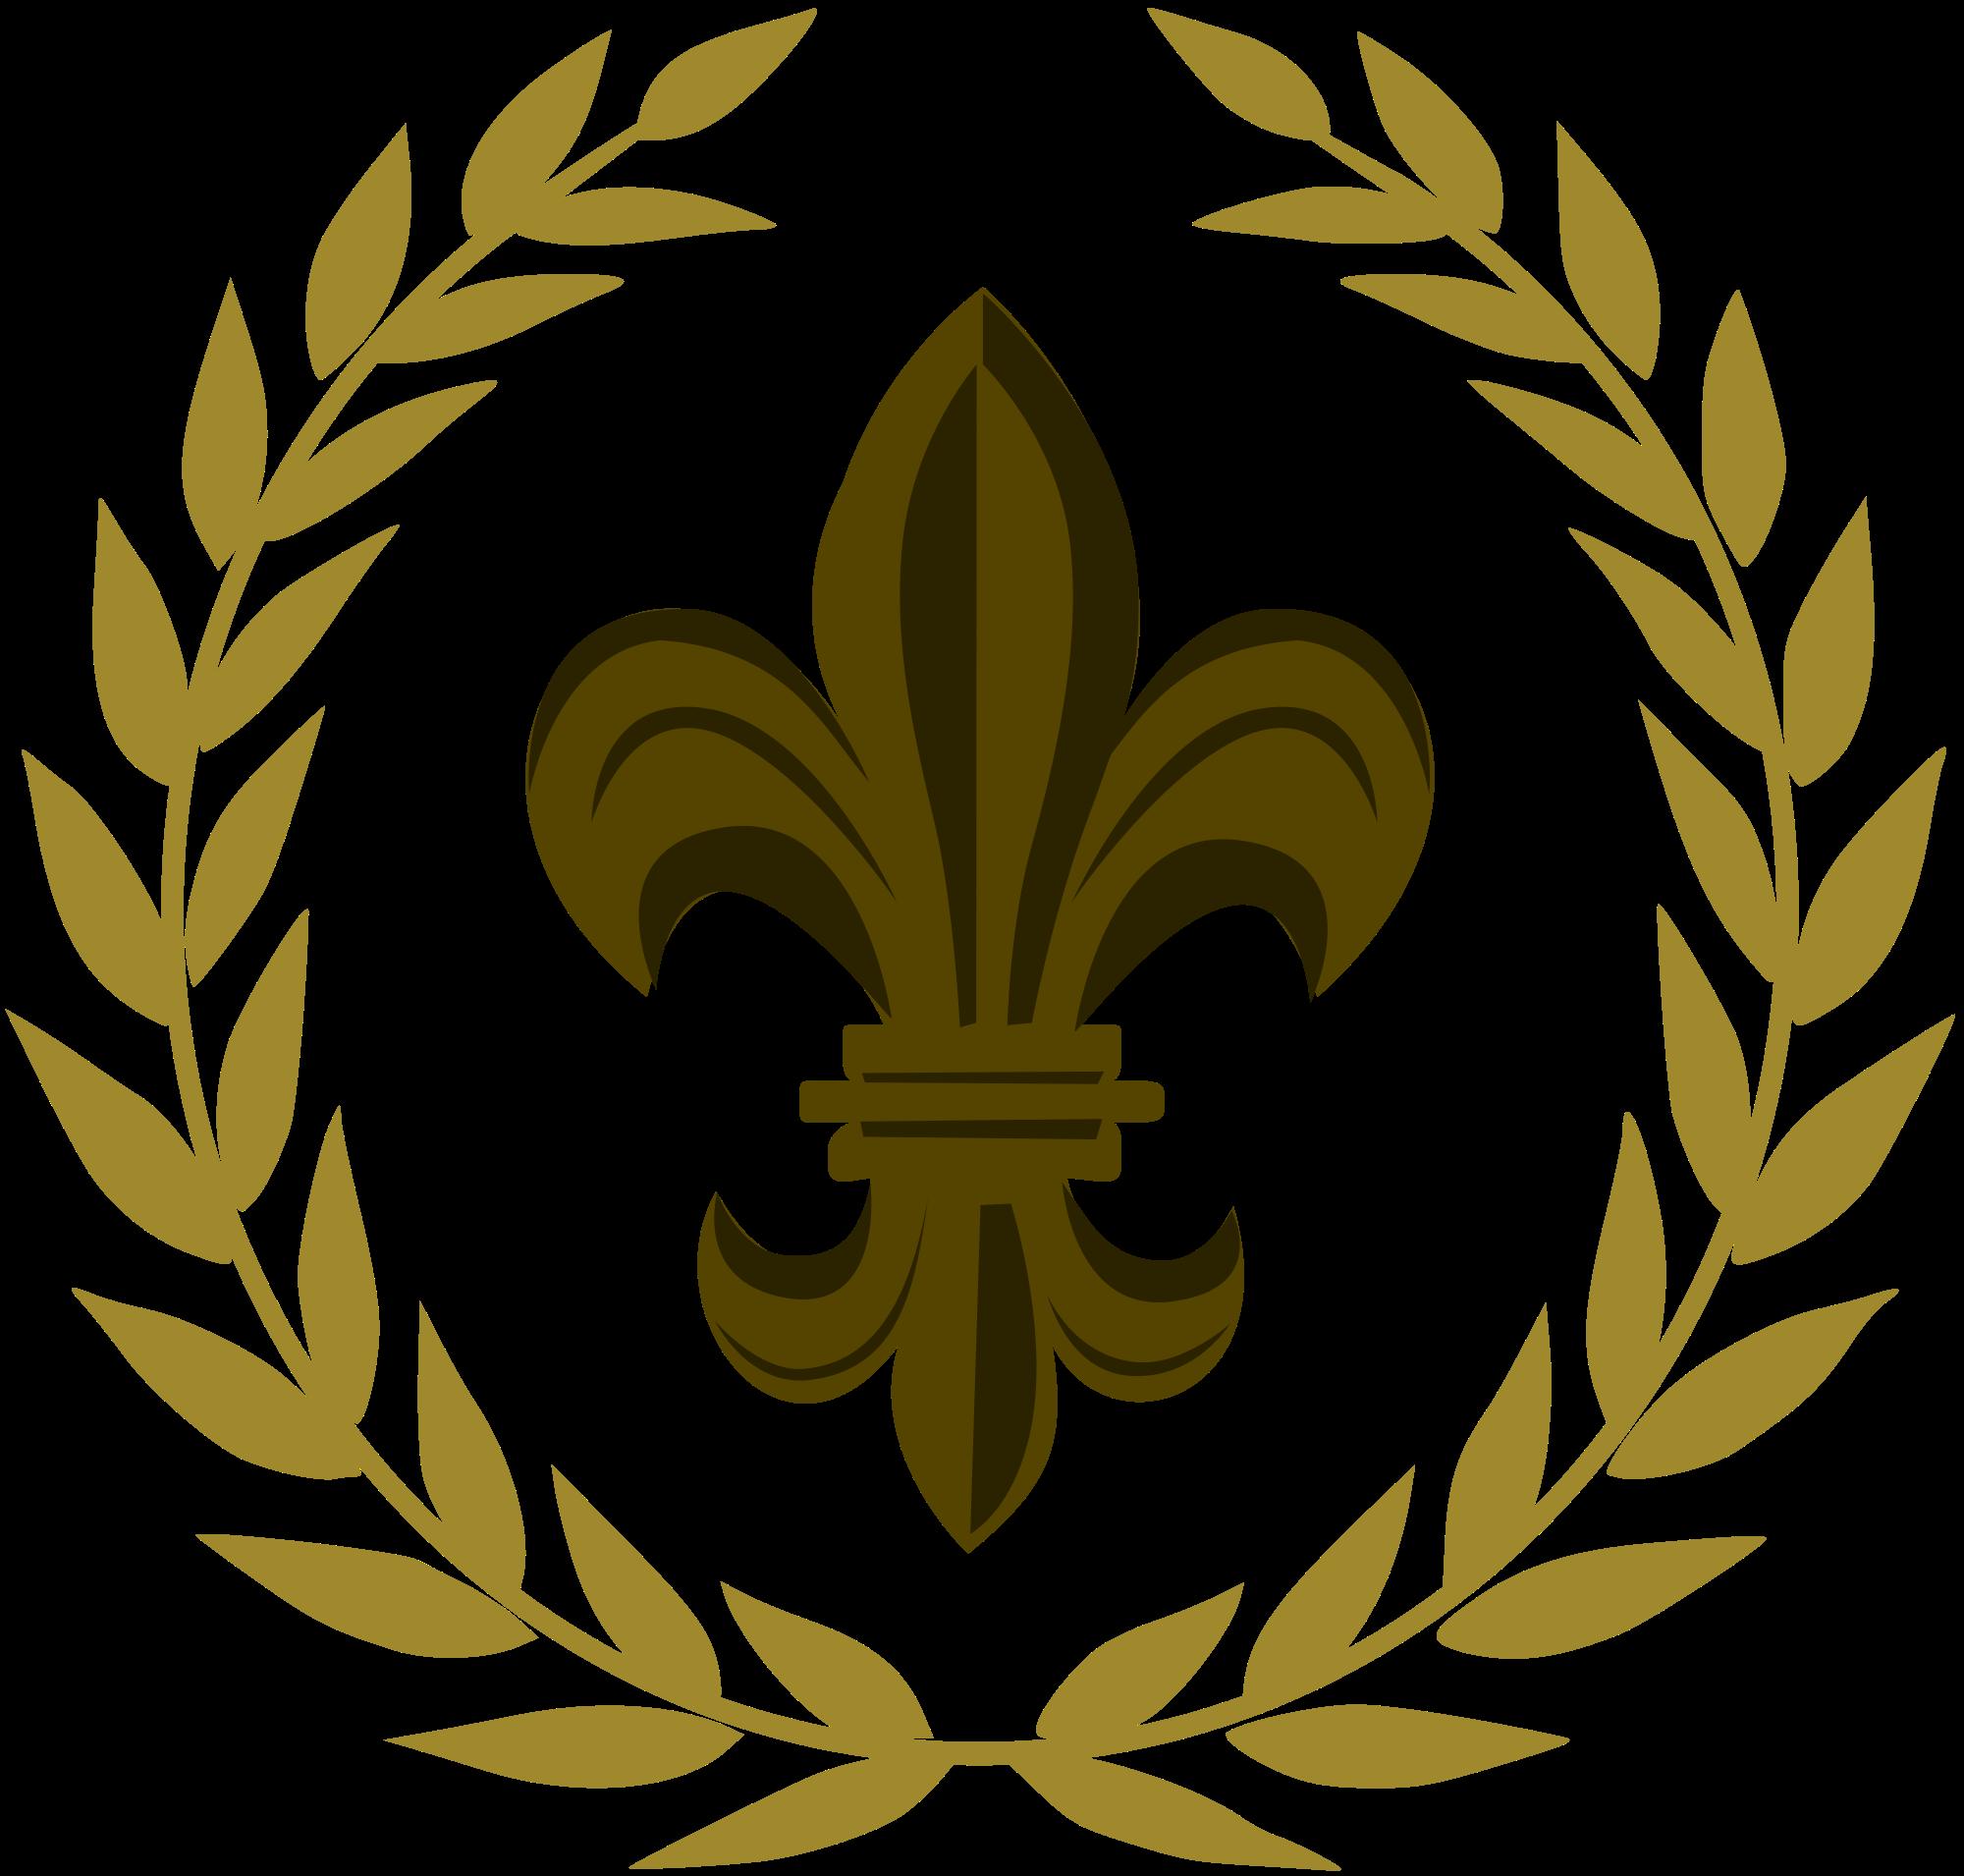 Laurel clipart bronze. File wikiproject scouting fleur